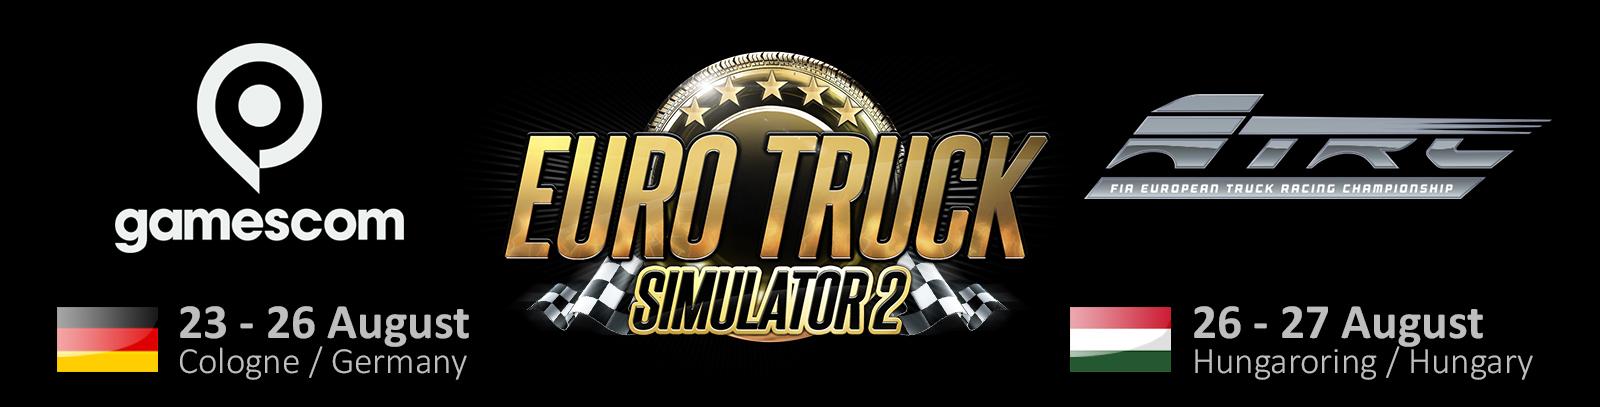 ETRC2017_gamescom_hungaroring.jpg